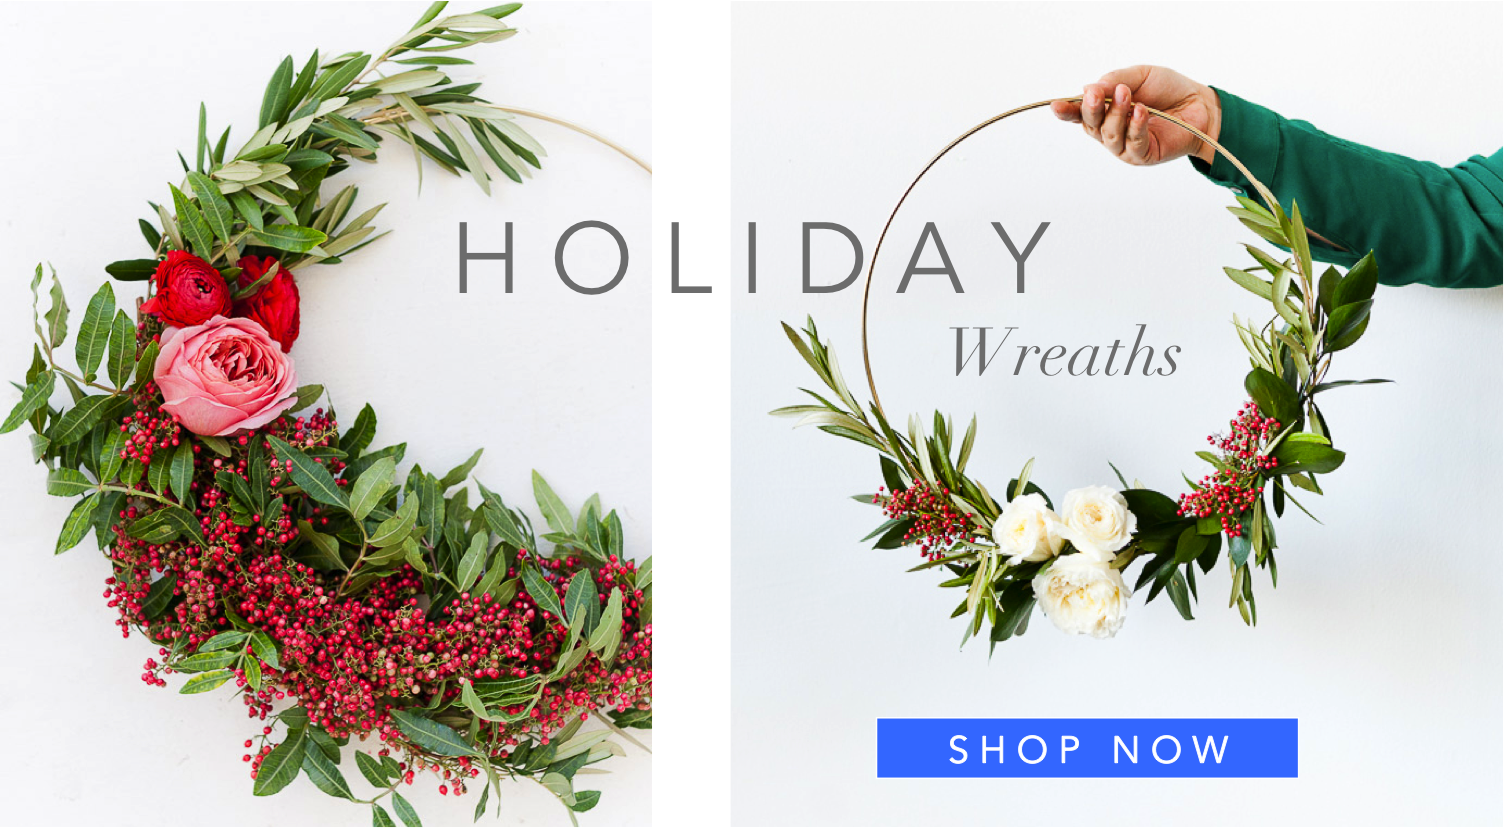 agie-s-floral-915-gift-holiday-christmas-wreaths-home-wreaths-coronas-para-casa-wreaths-el-paso-wreaths.png